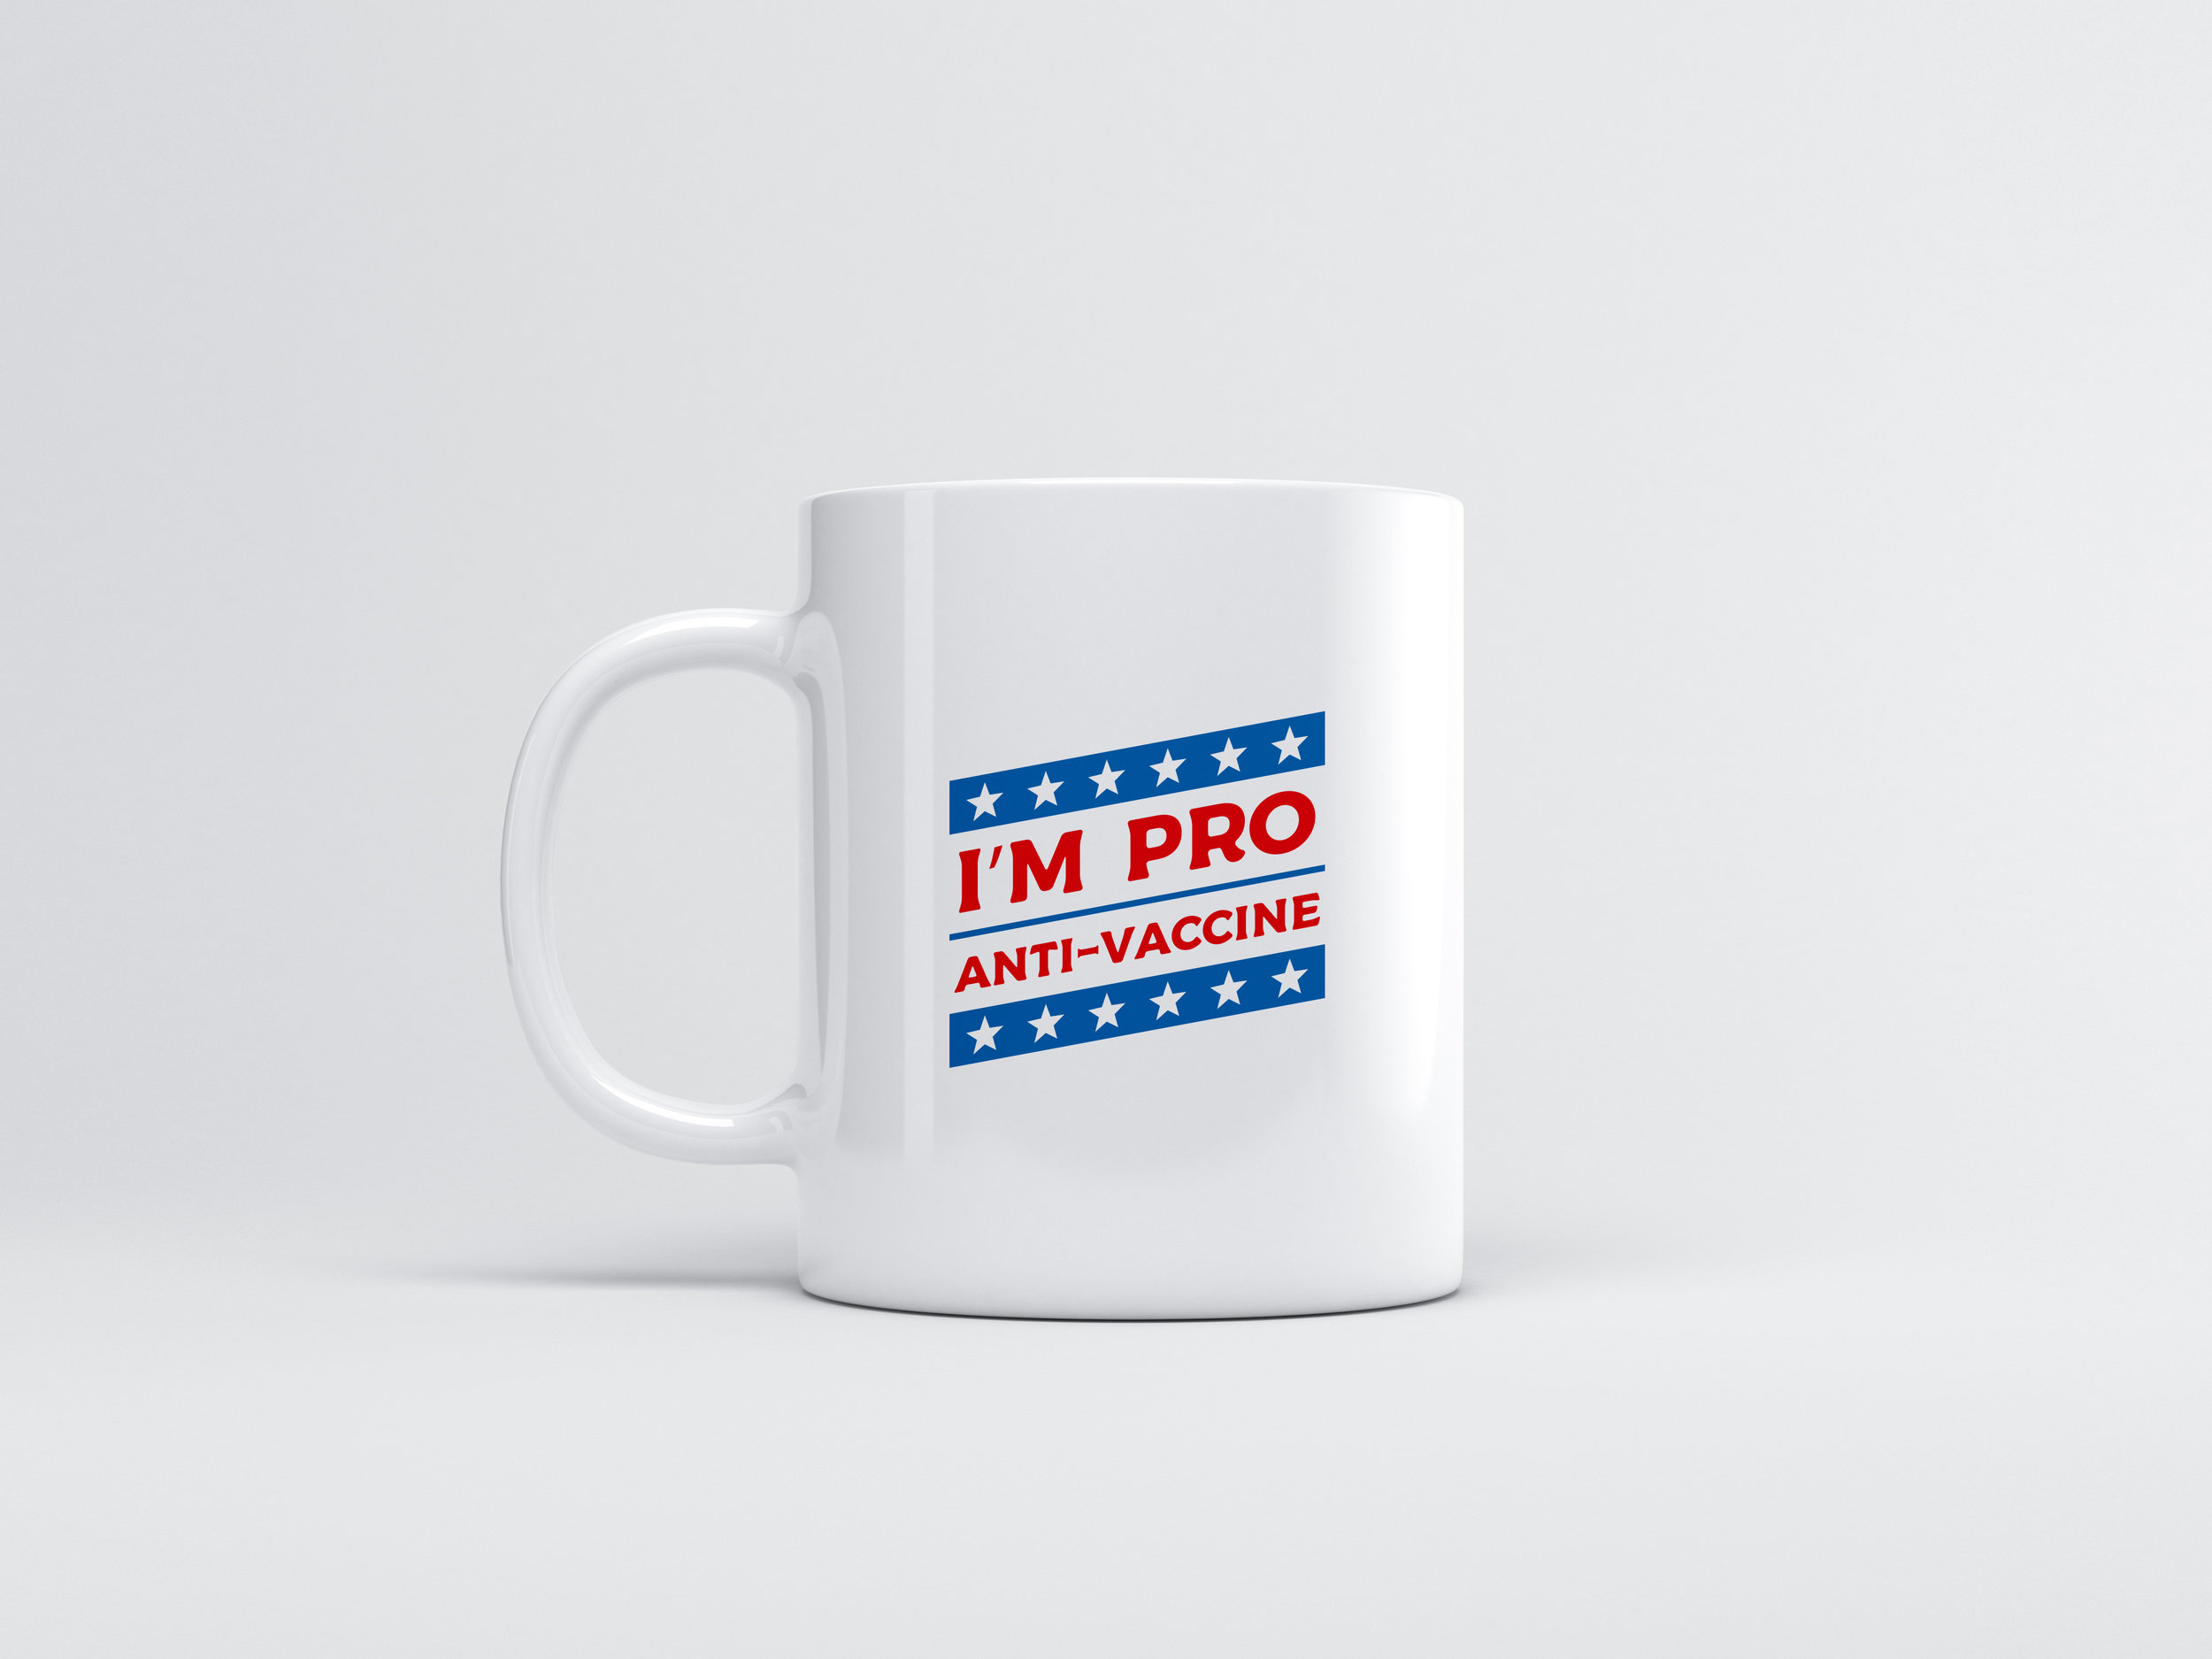 Pro Anti-Vaccine - mug.jpg